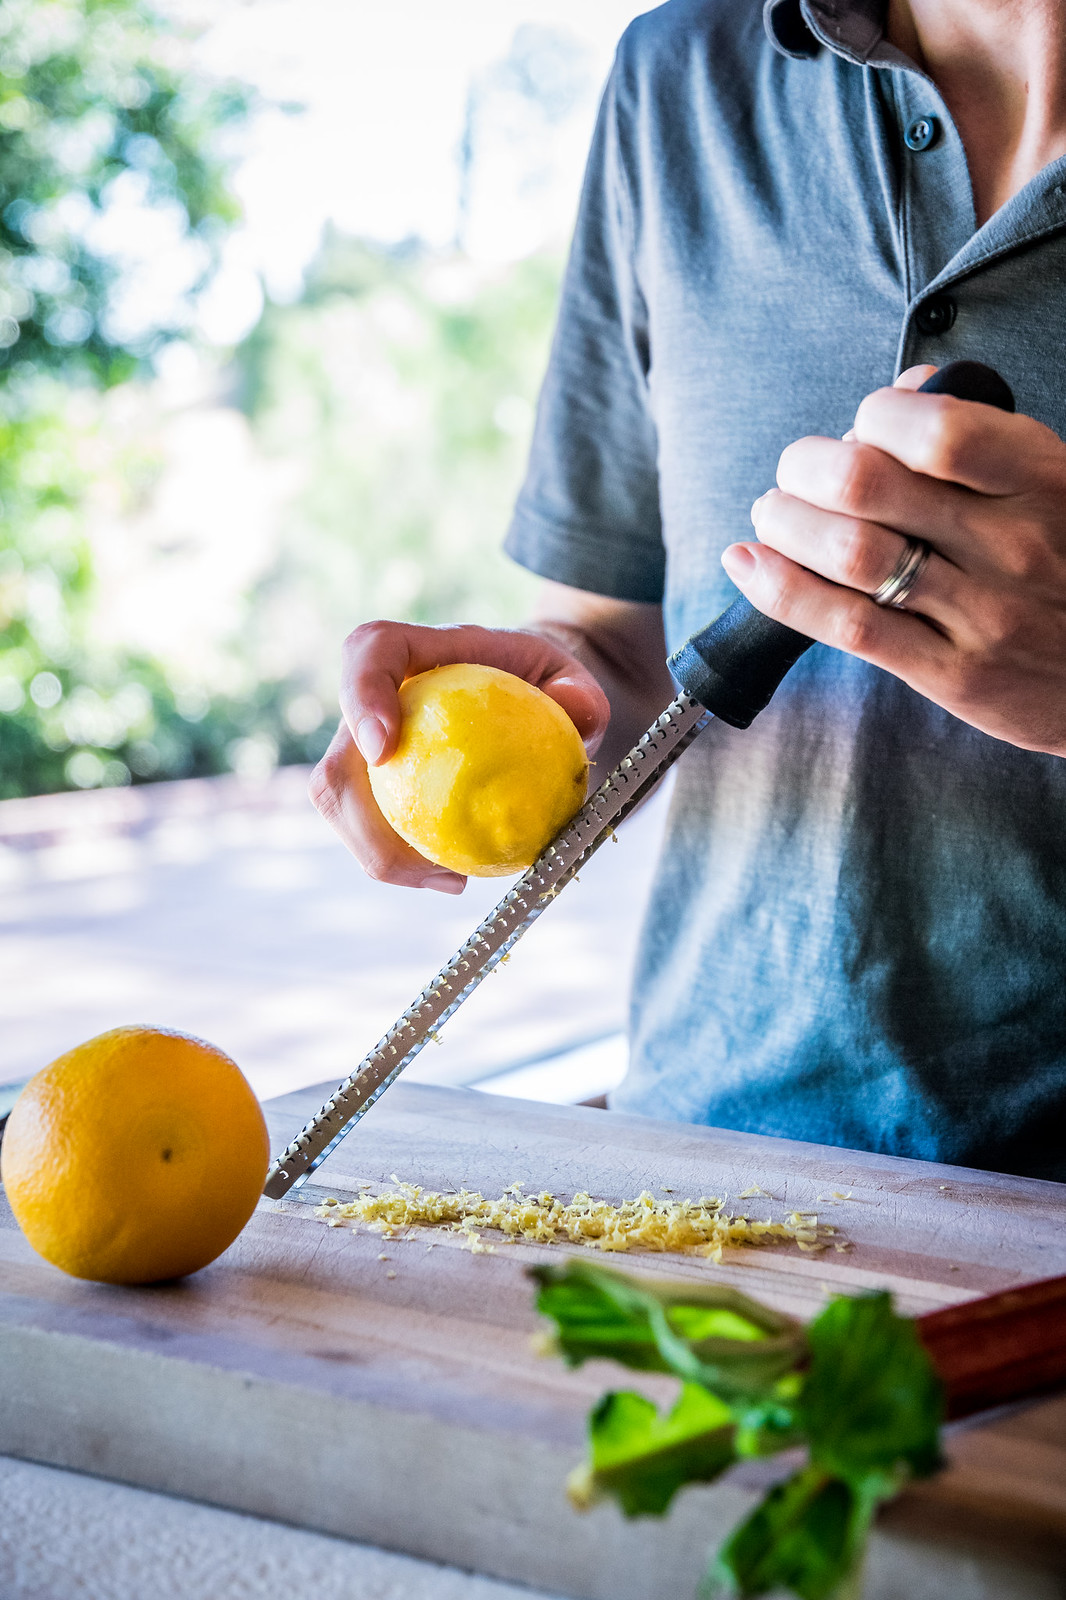 lemon and orange zest for a bright burst of citrus